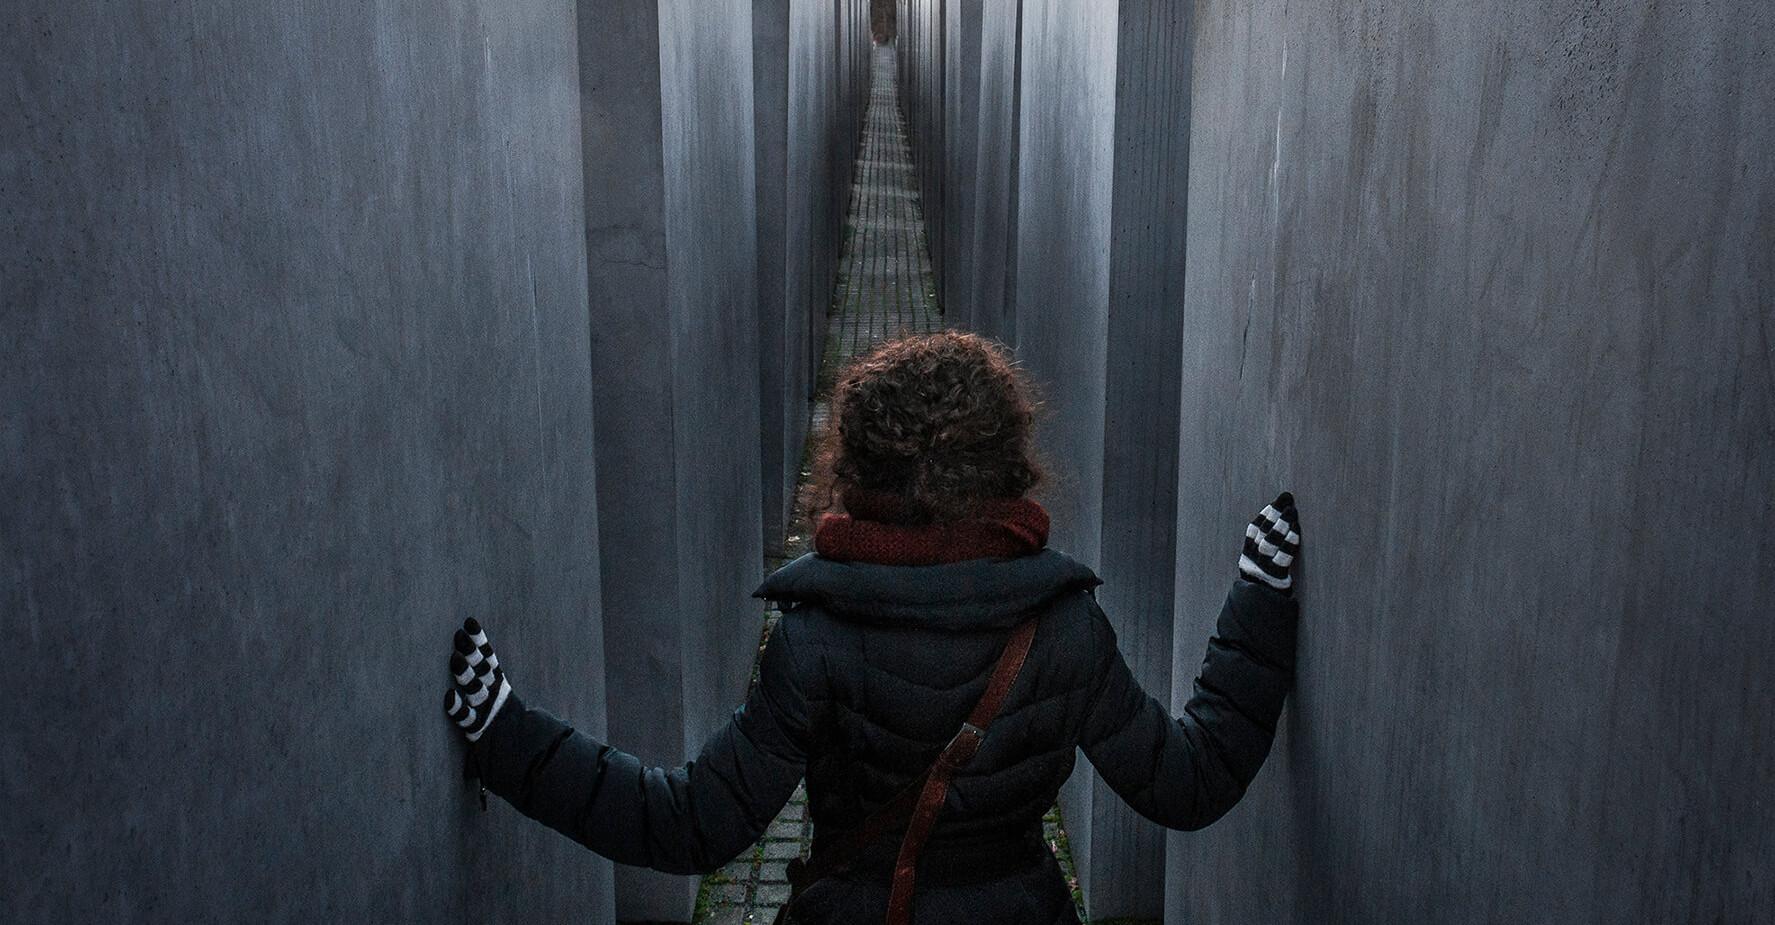 Candela at Holocaust Monument.jpg